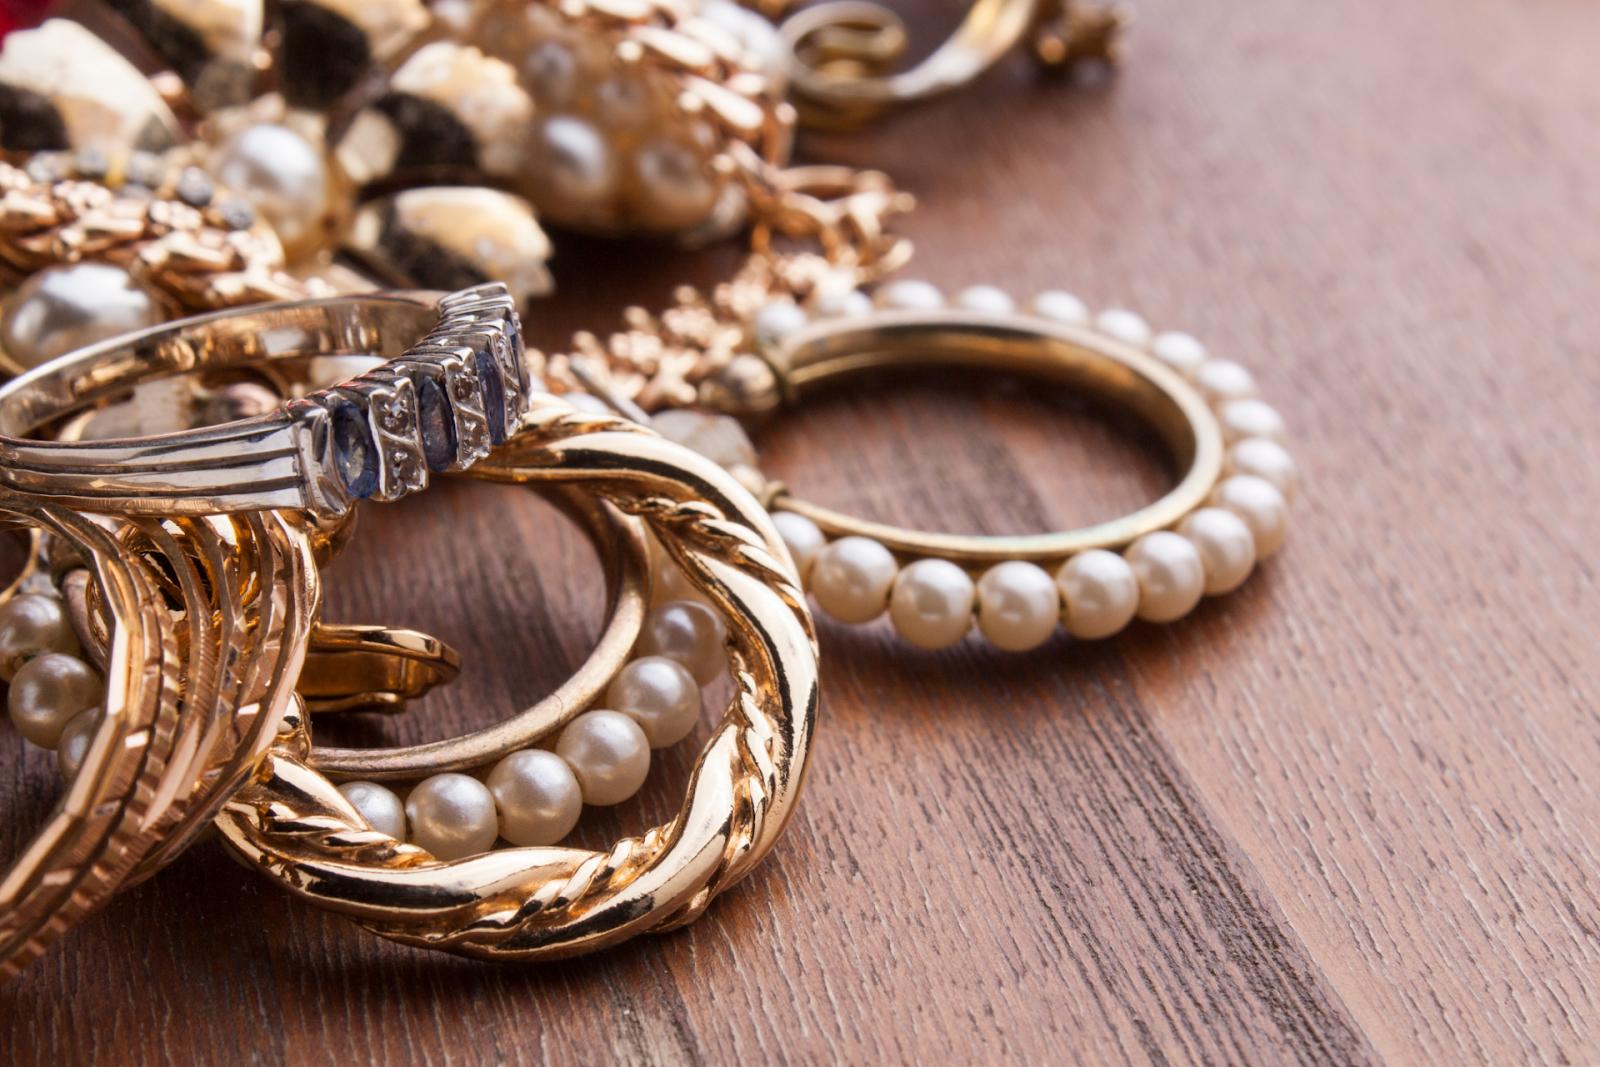 fashionable women's jewelry